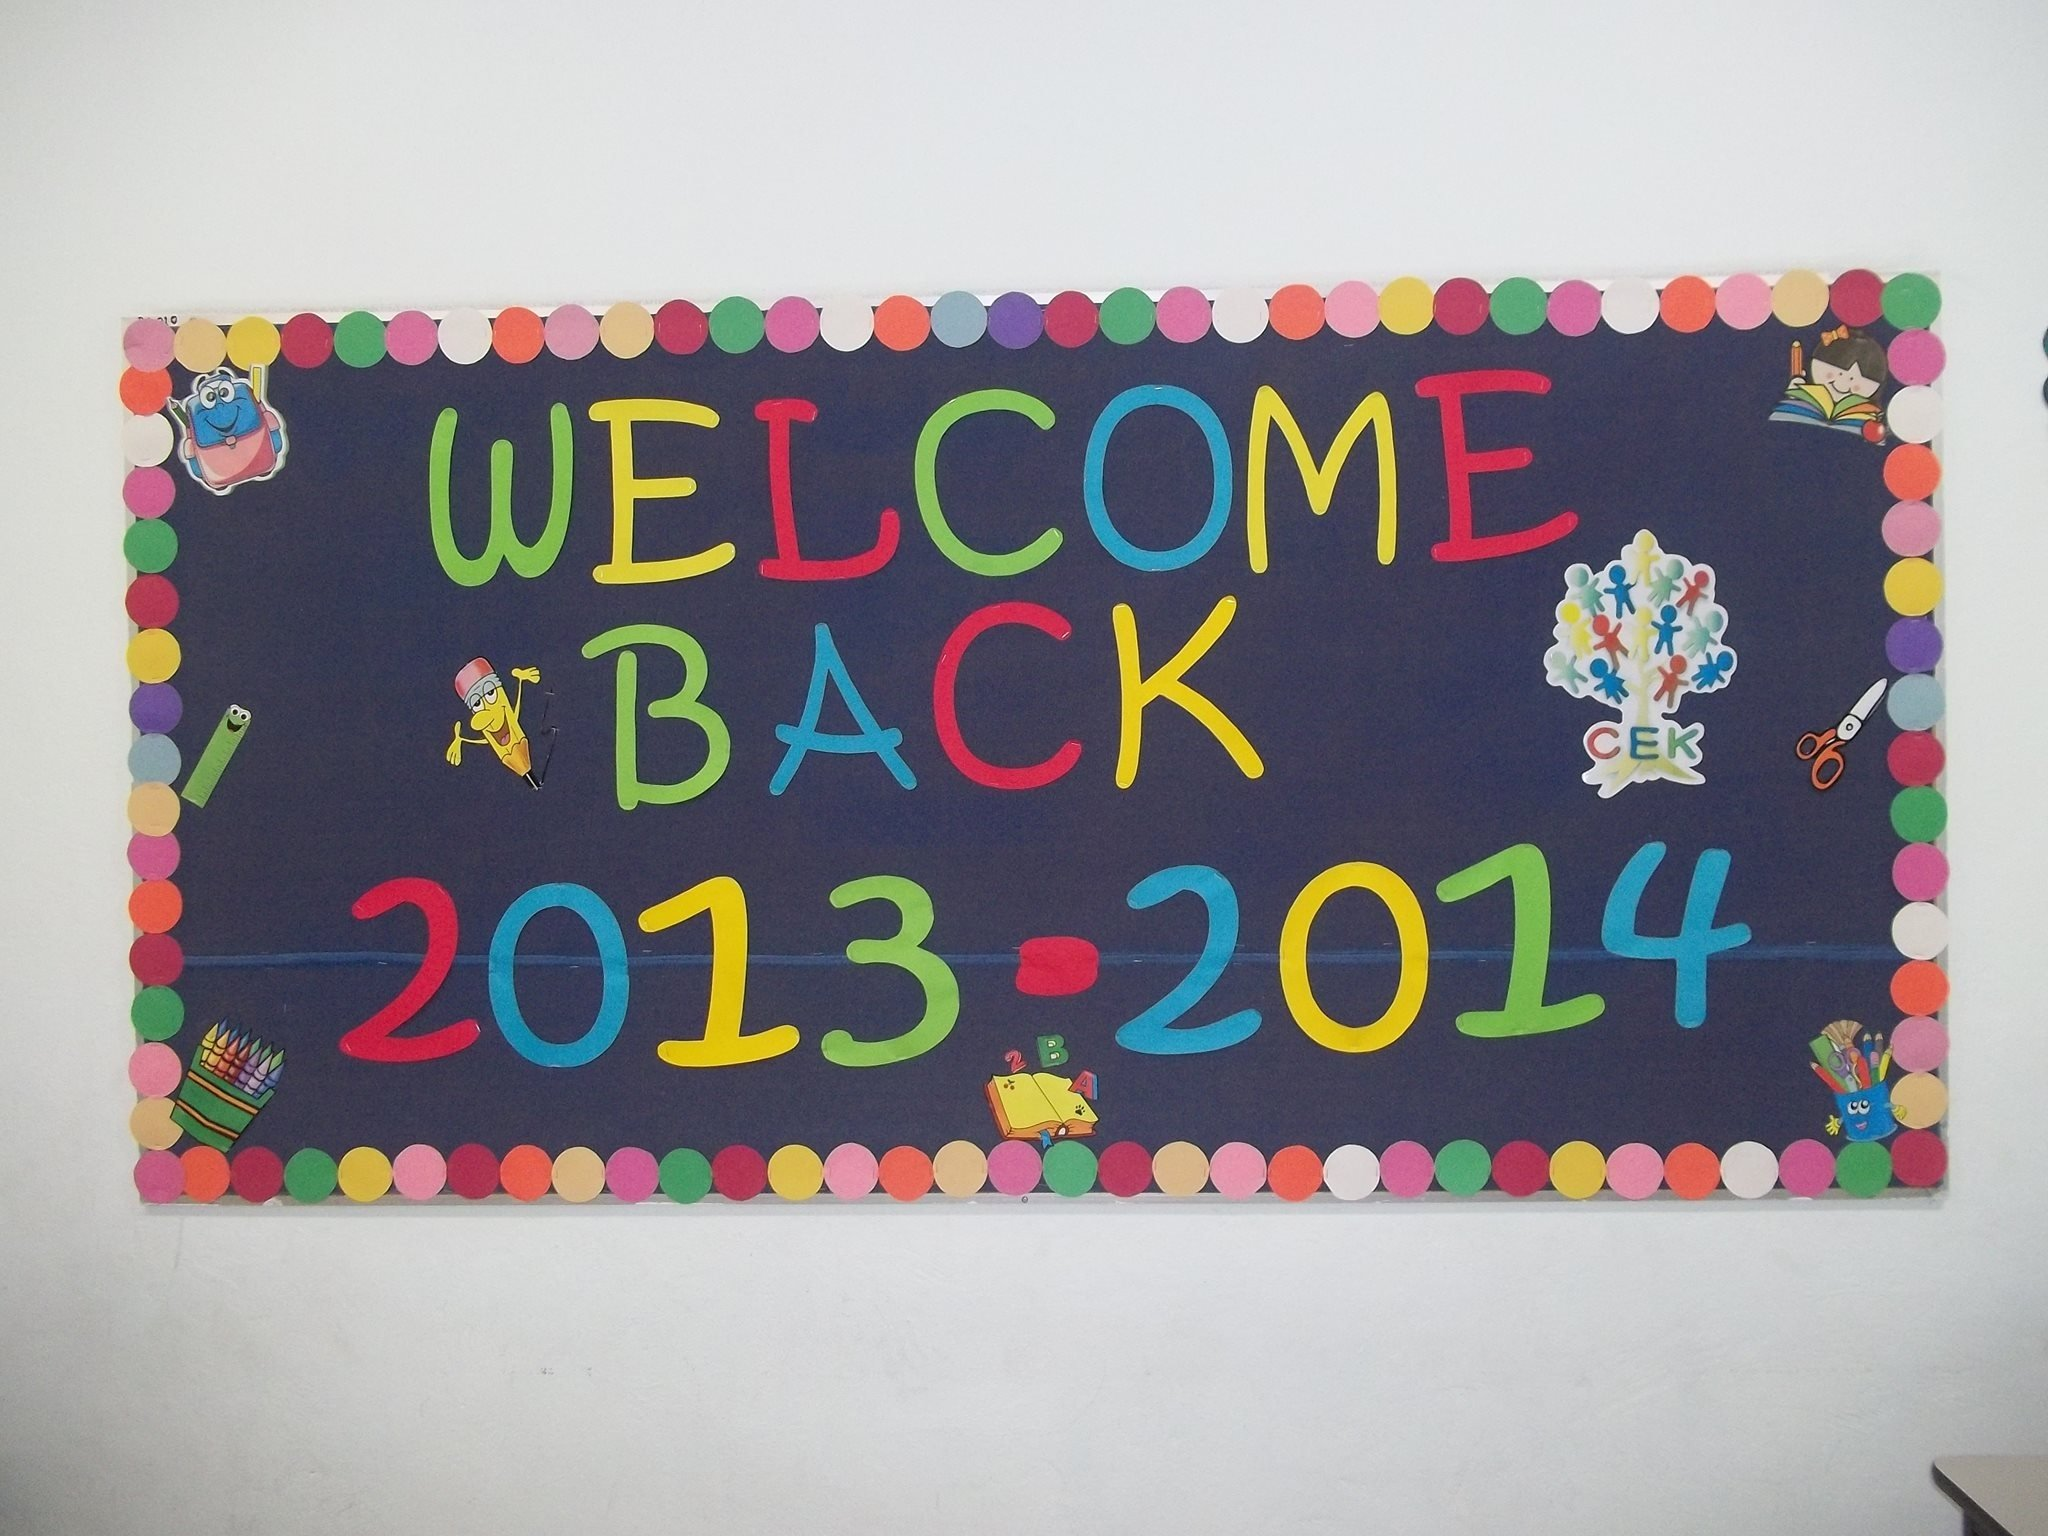 10 Beautiful Back To School Decoration Ideas ides de welcome back to school decorations galerie dimages 2 2021